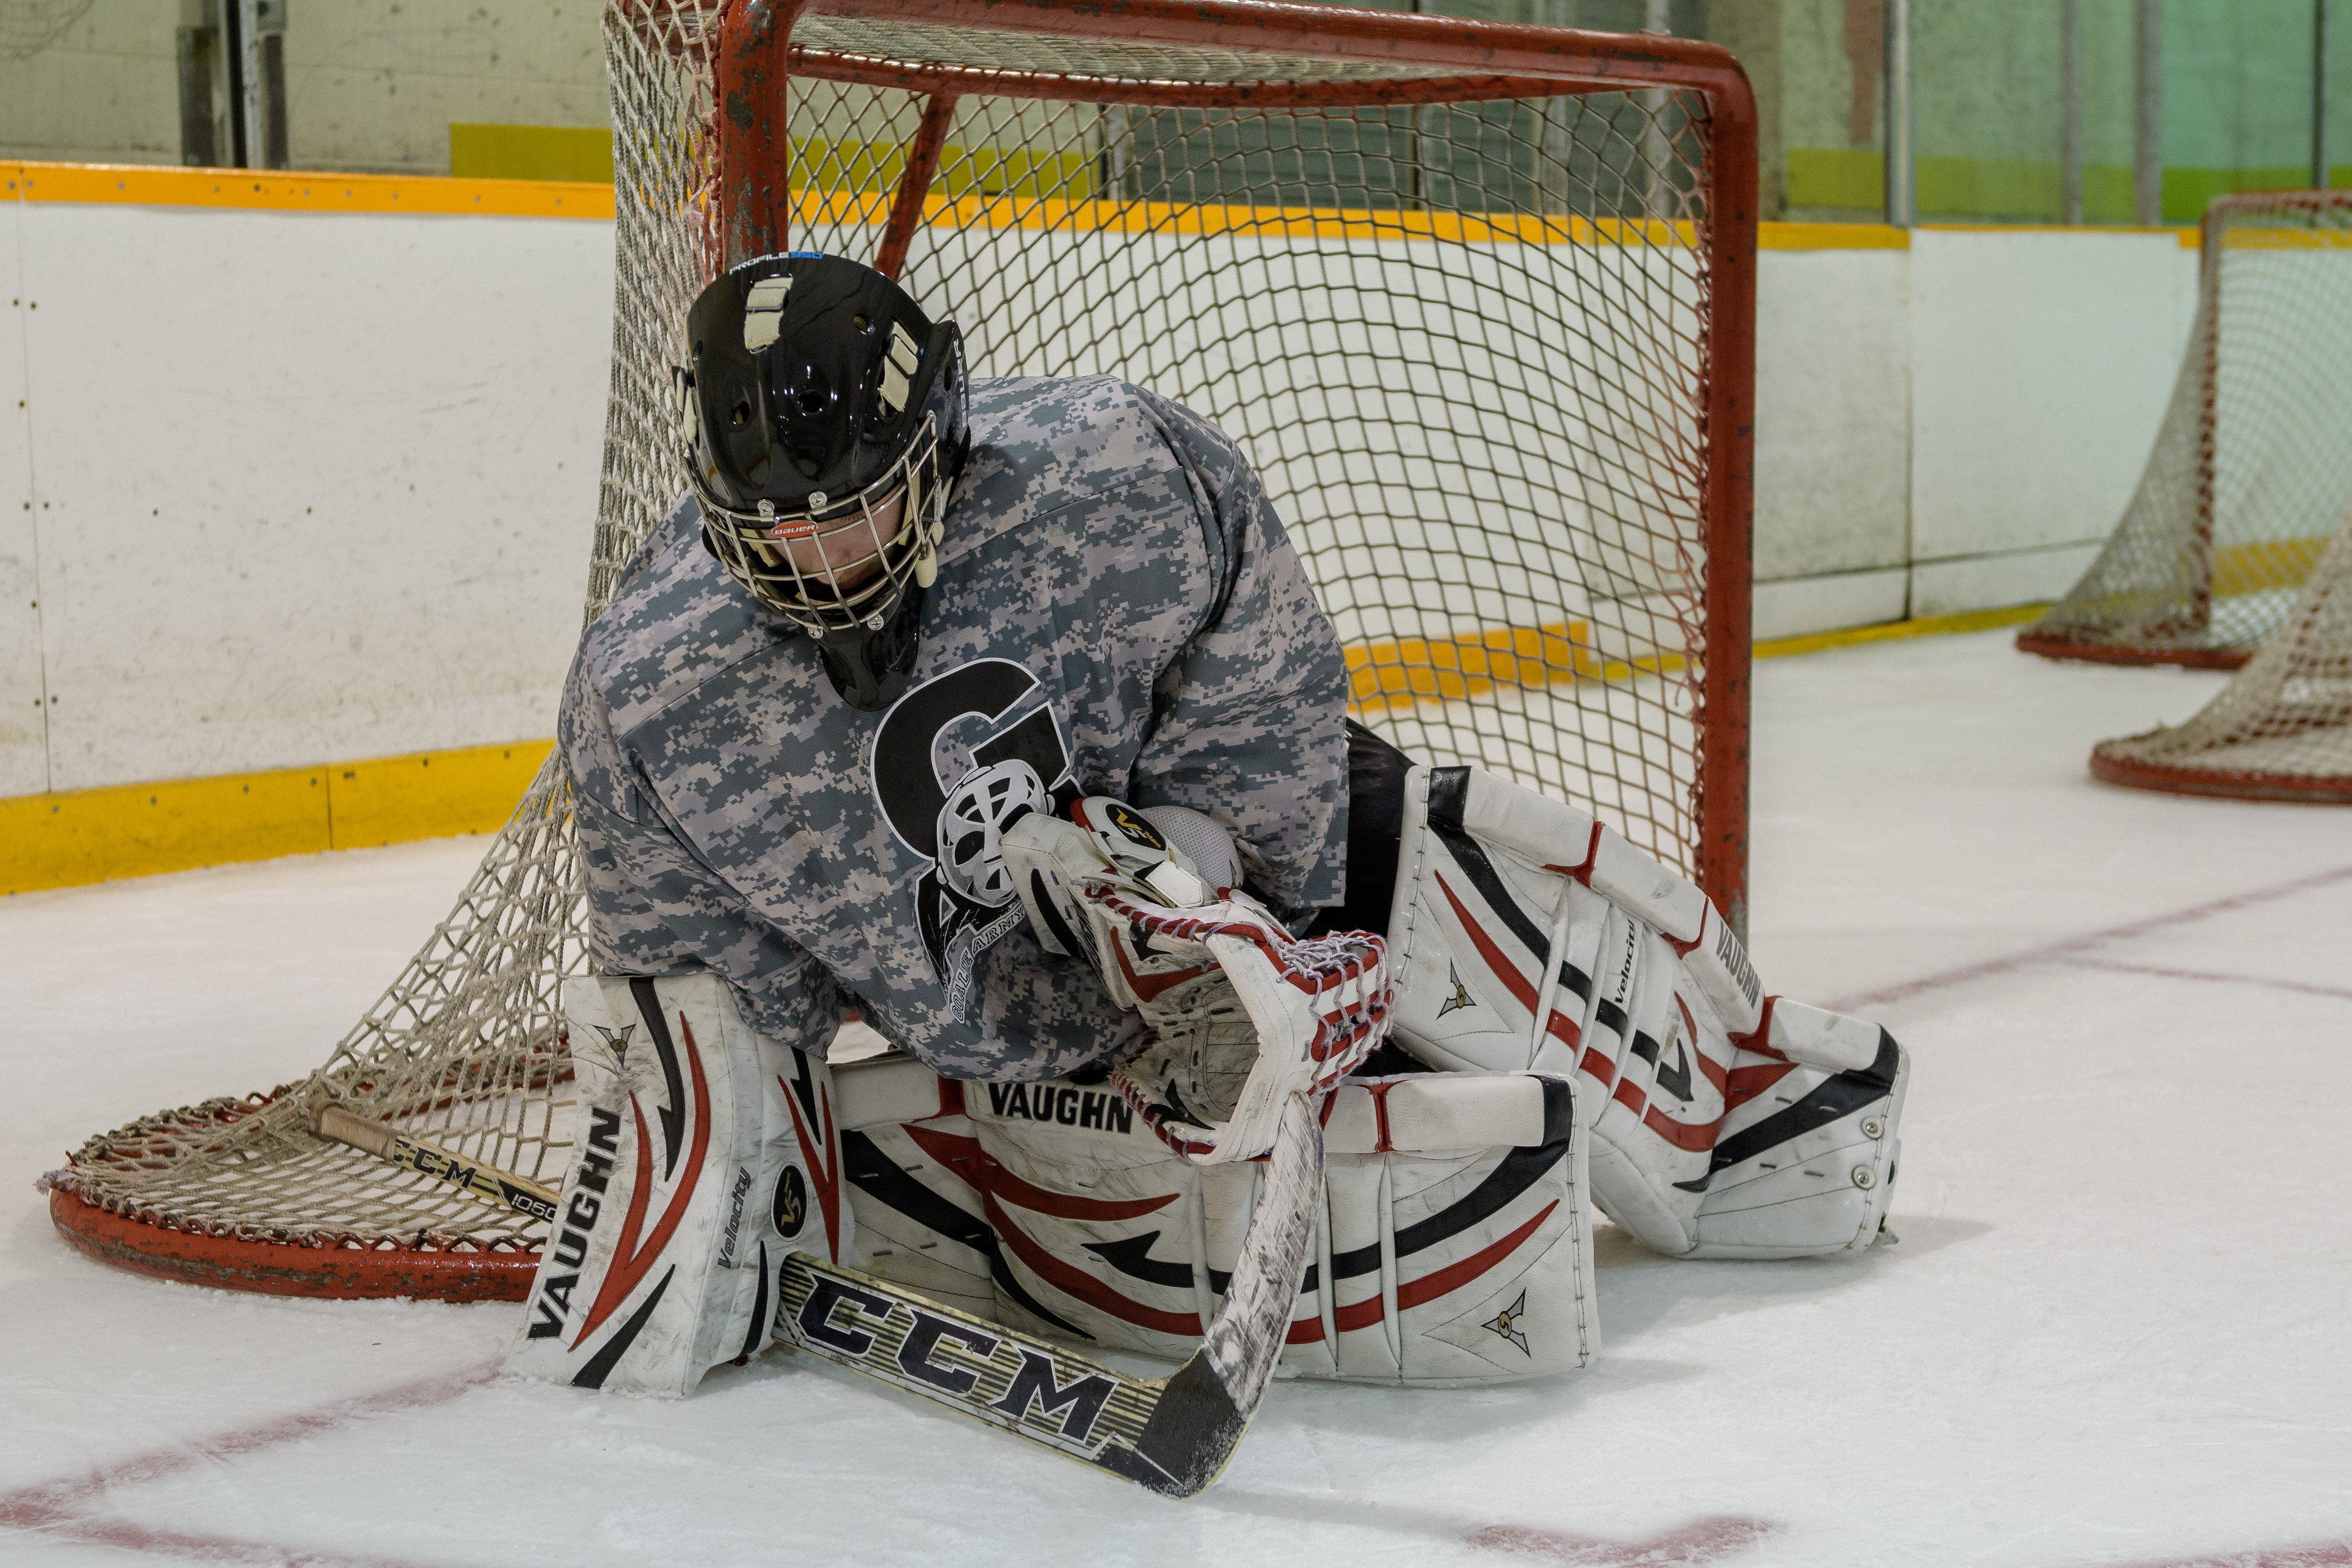 Blog Gaahockey Elite Ottawa Goalie Training